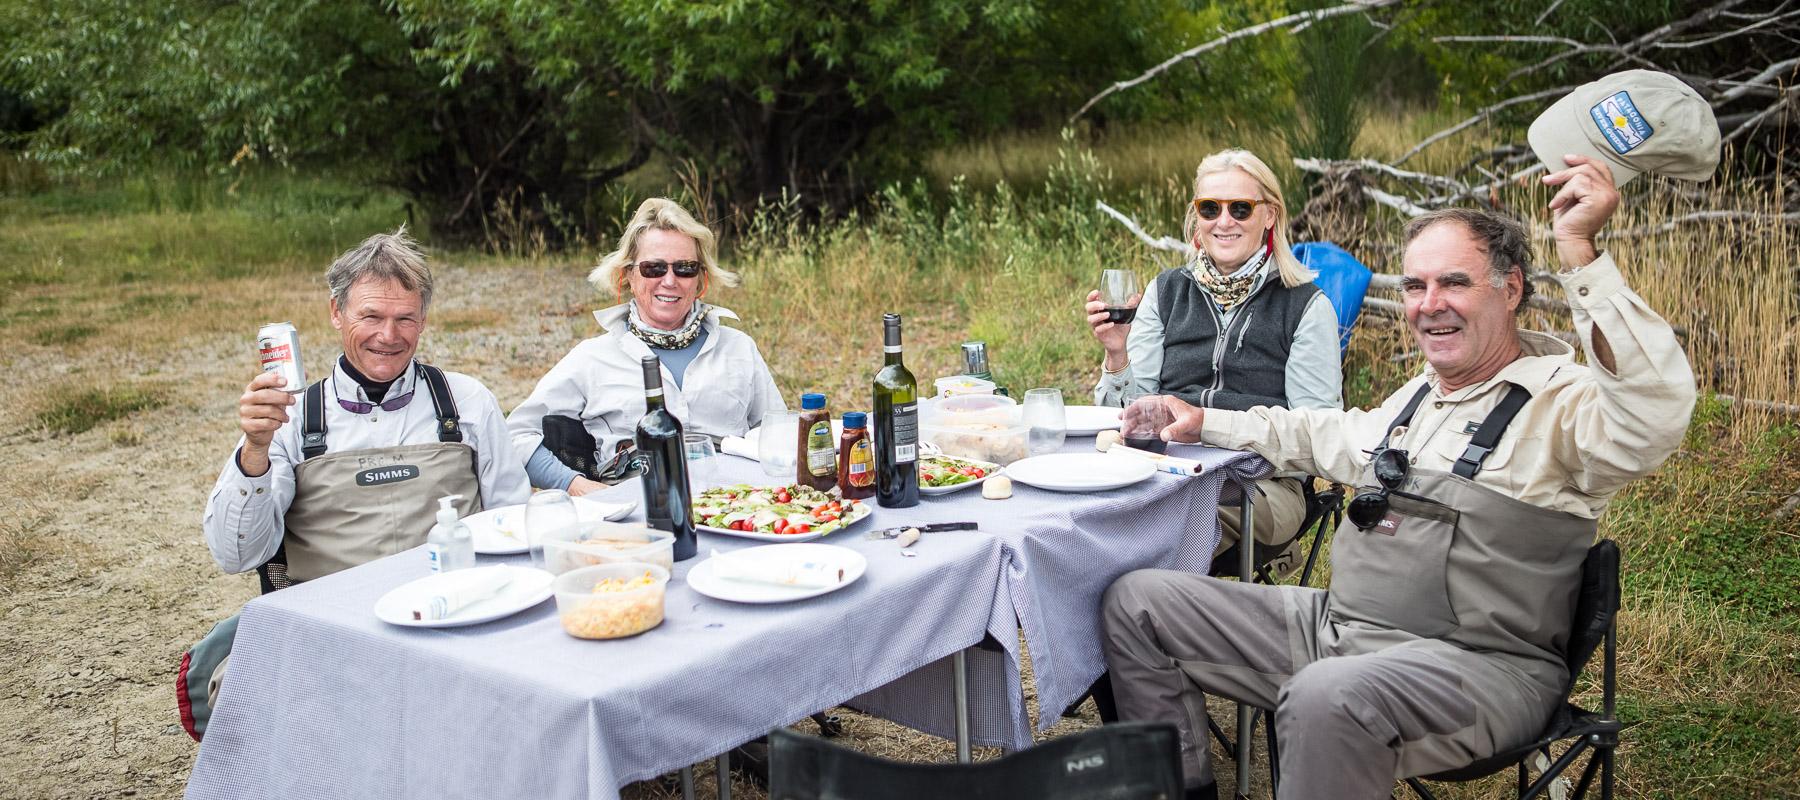 patagonia-river-guides-argentina-096